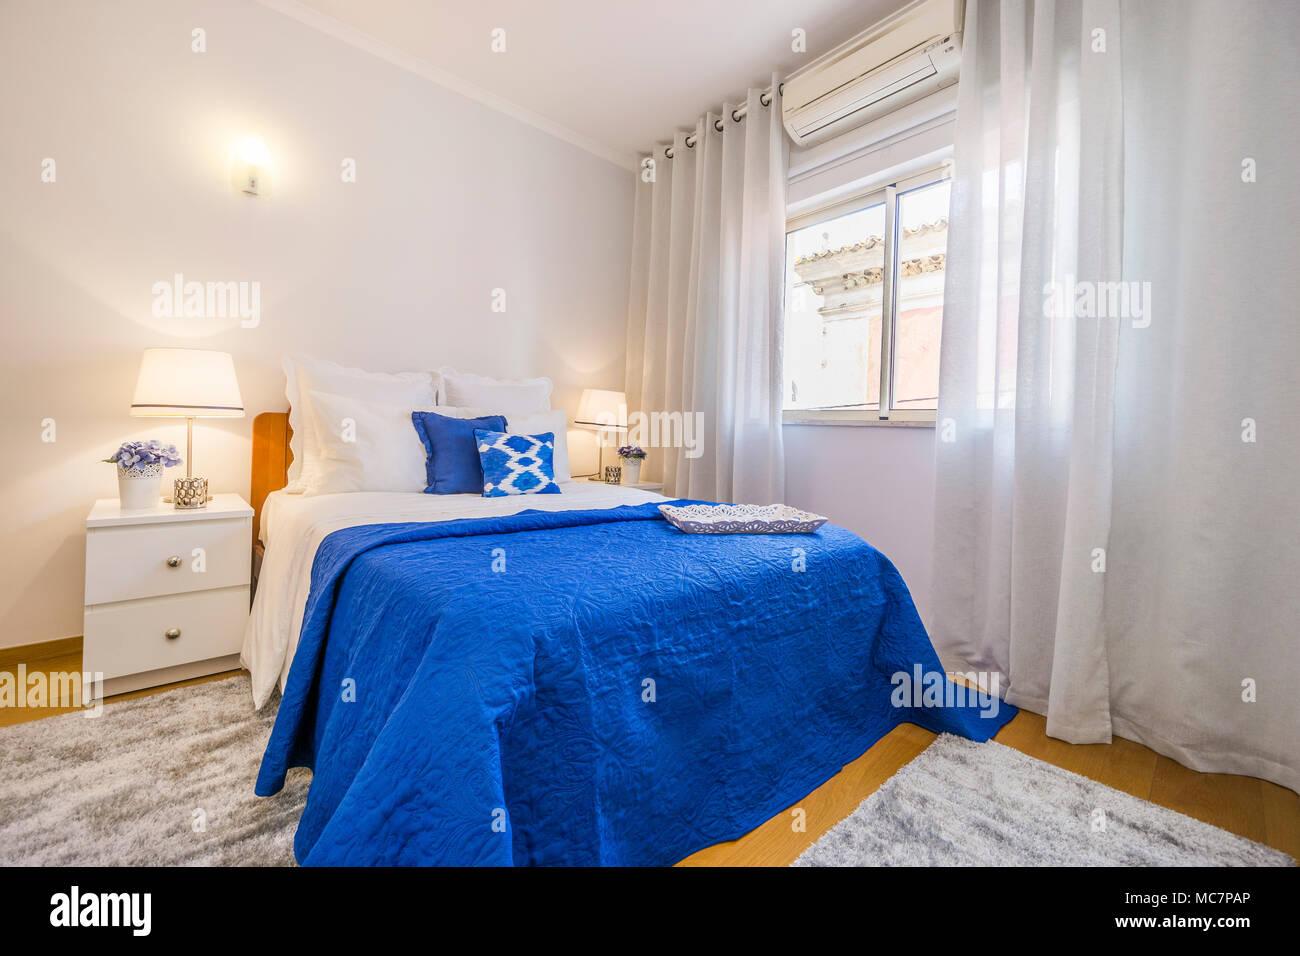 Regale An Der Wand Im Schlafzimmer Stockfotos & Regale An ...